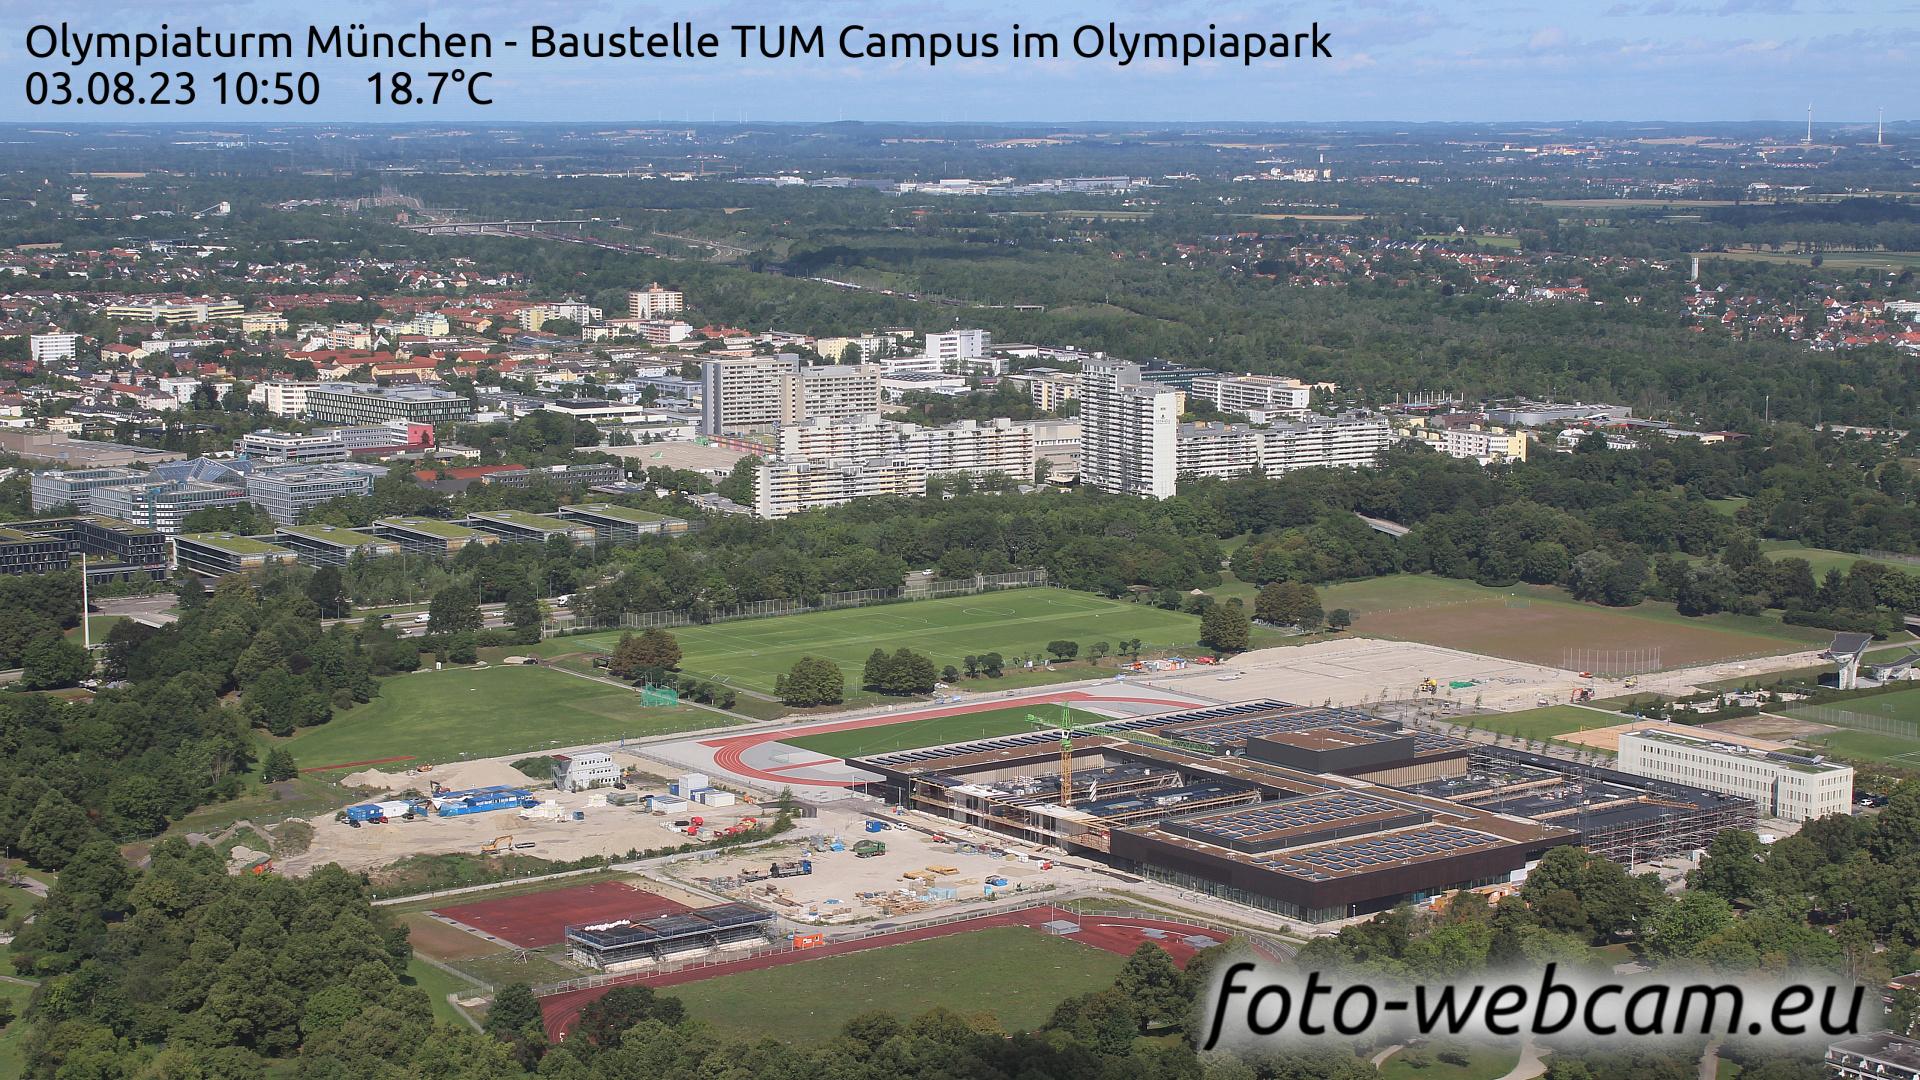 Munich Tue. 10:30